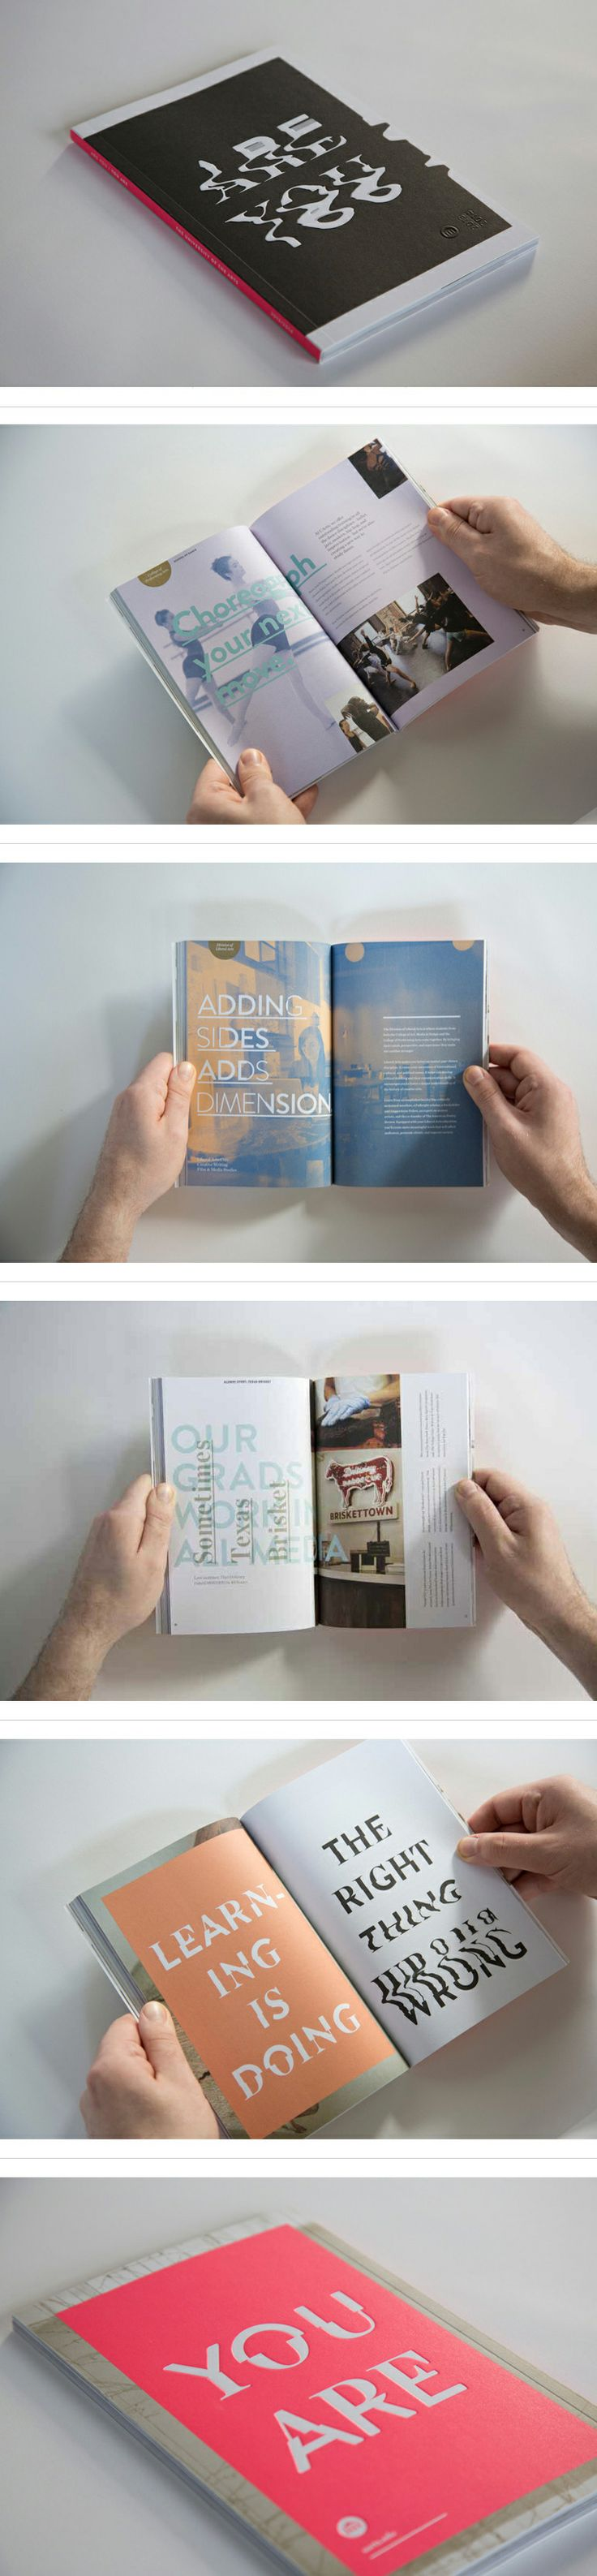 University of the Arts Viewbook